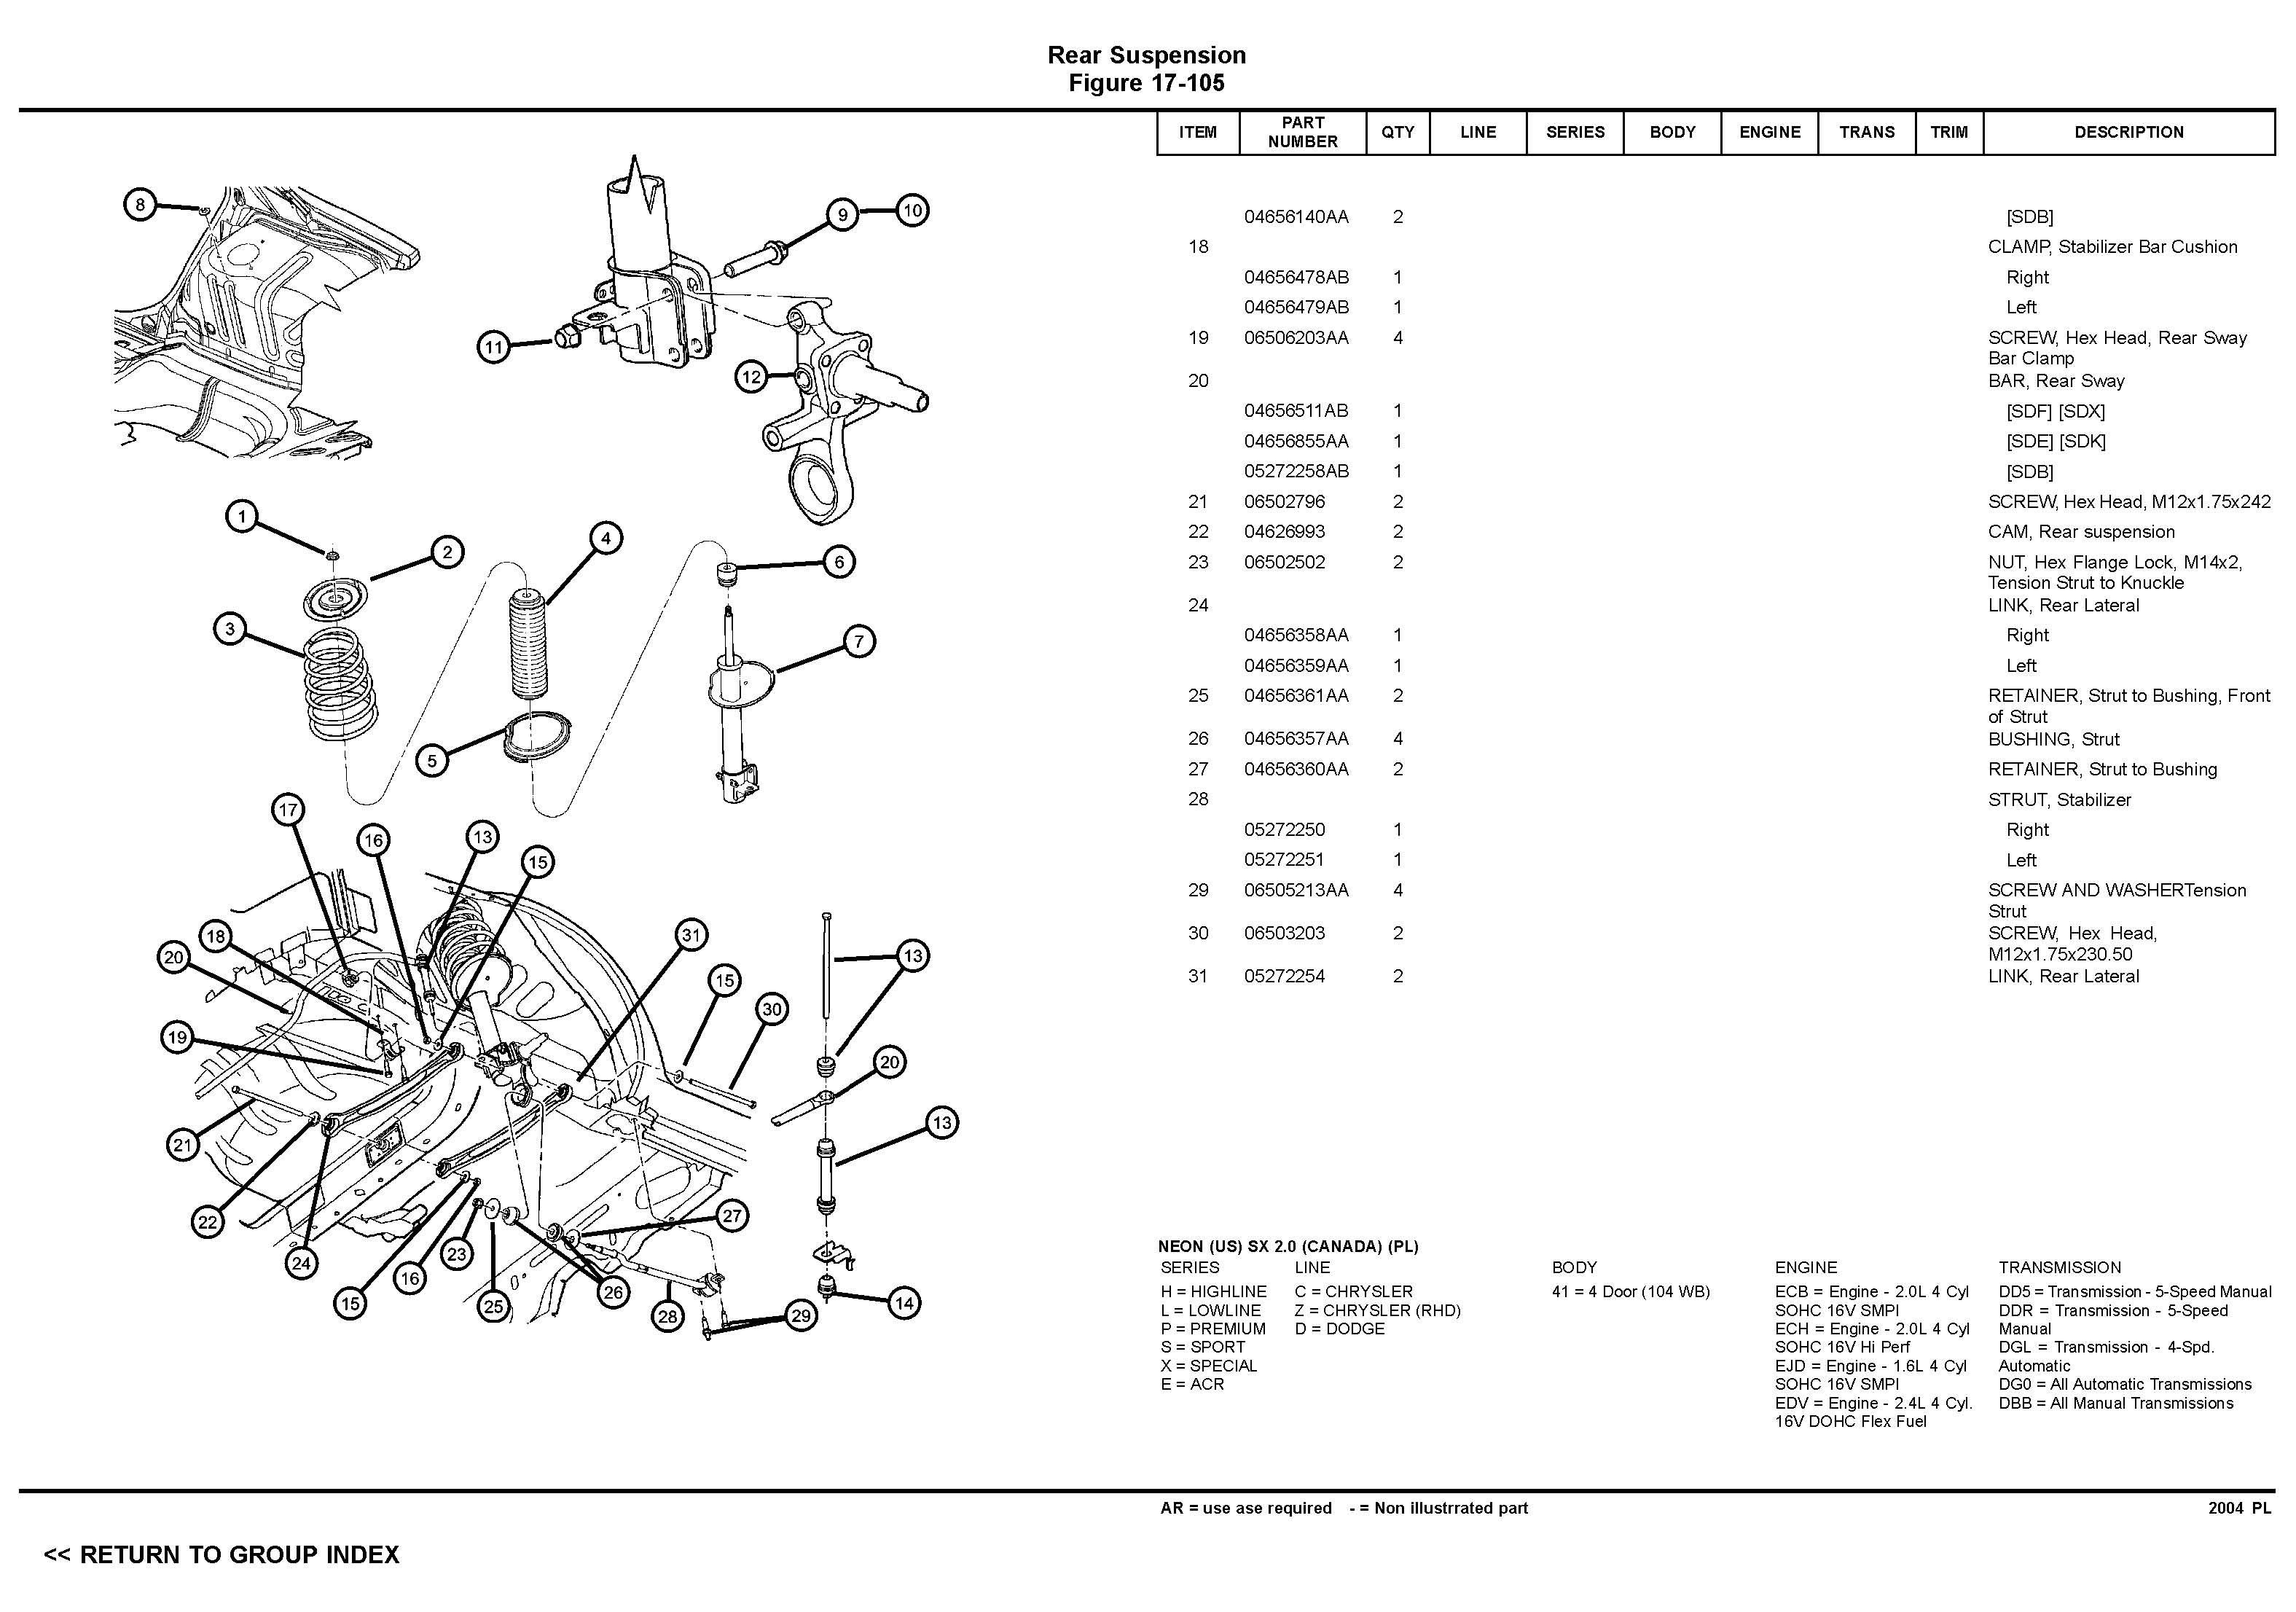 64571d1344690089 srt 4 suspension faq discountmoparparts.net 04pl_page_208 srt 4 suspension faq dodge srt forum srt 4 engine diagram at gsmx.co